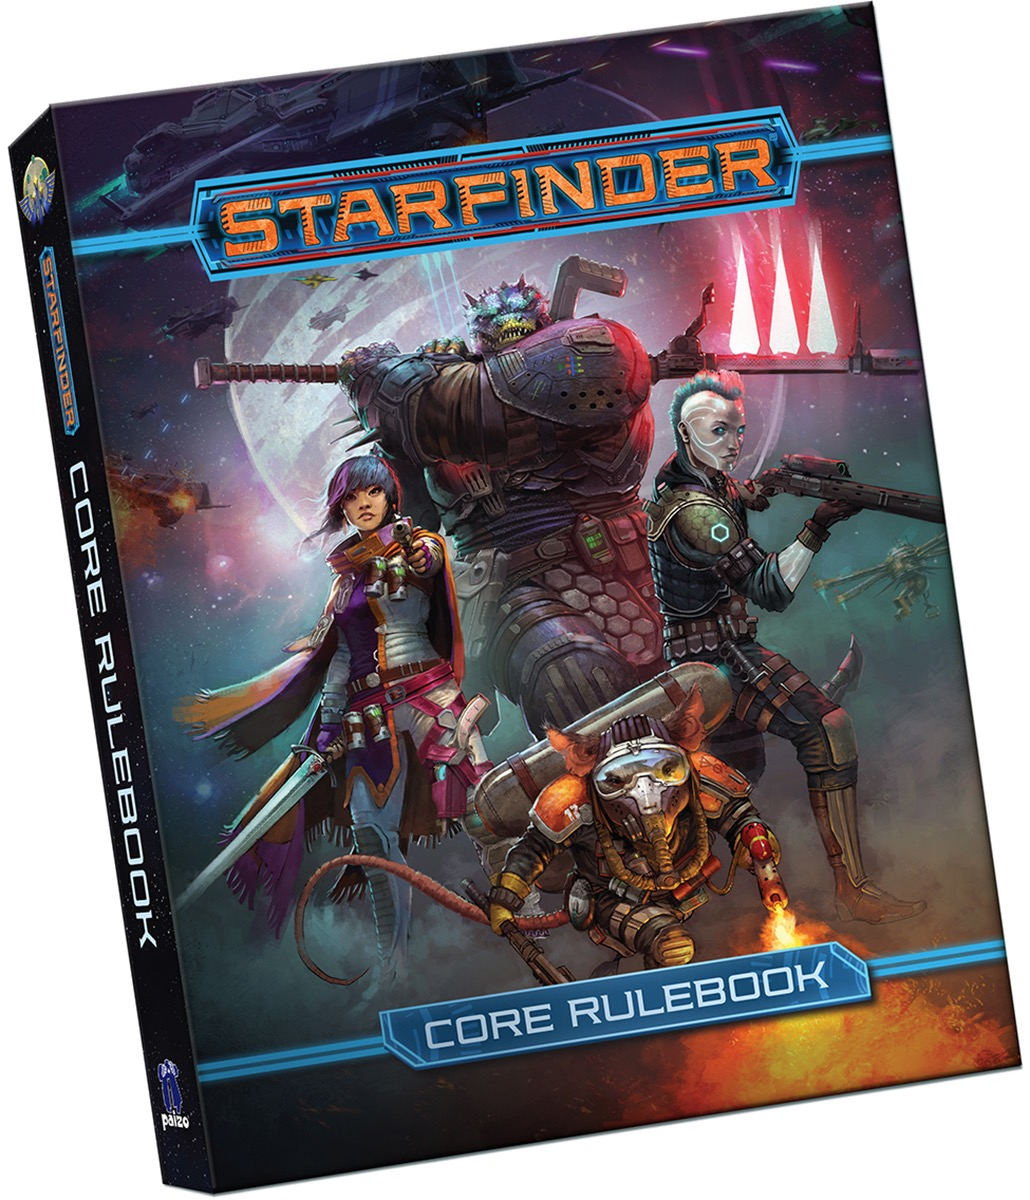 Starfinder Rpg: Core Rulebook (pocket Edition)